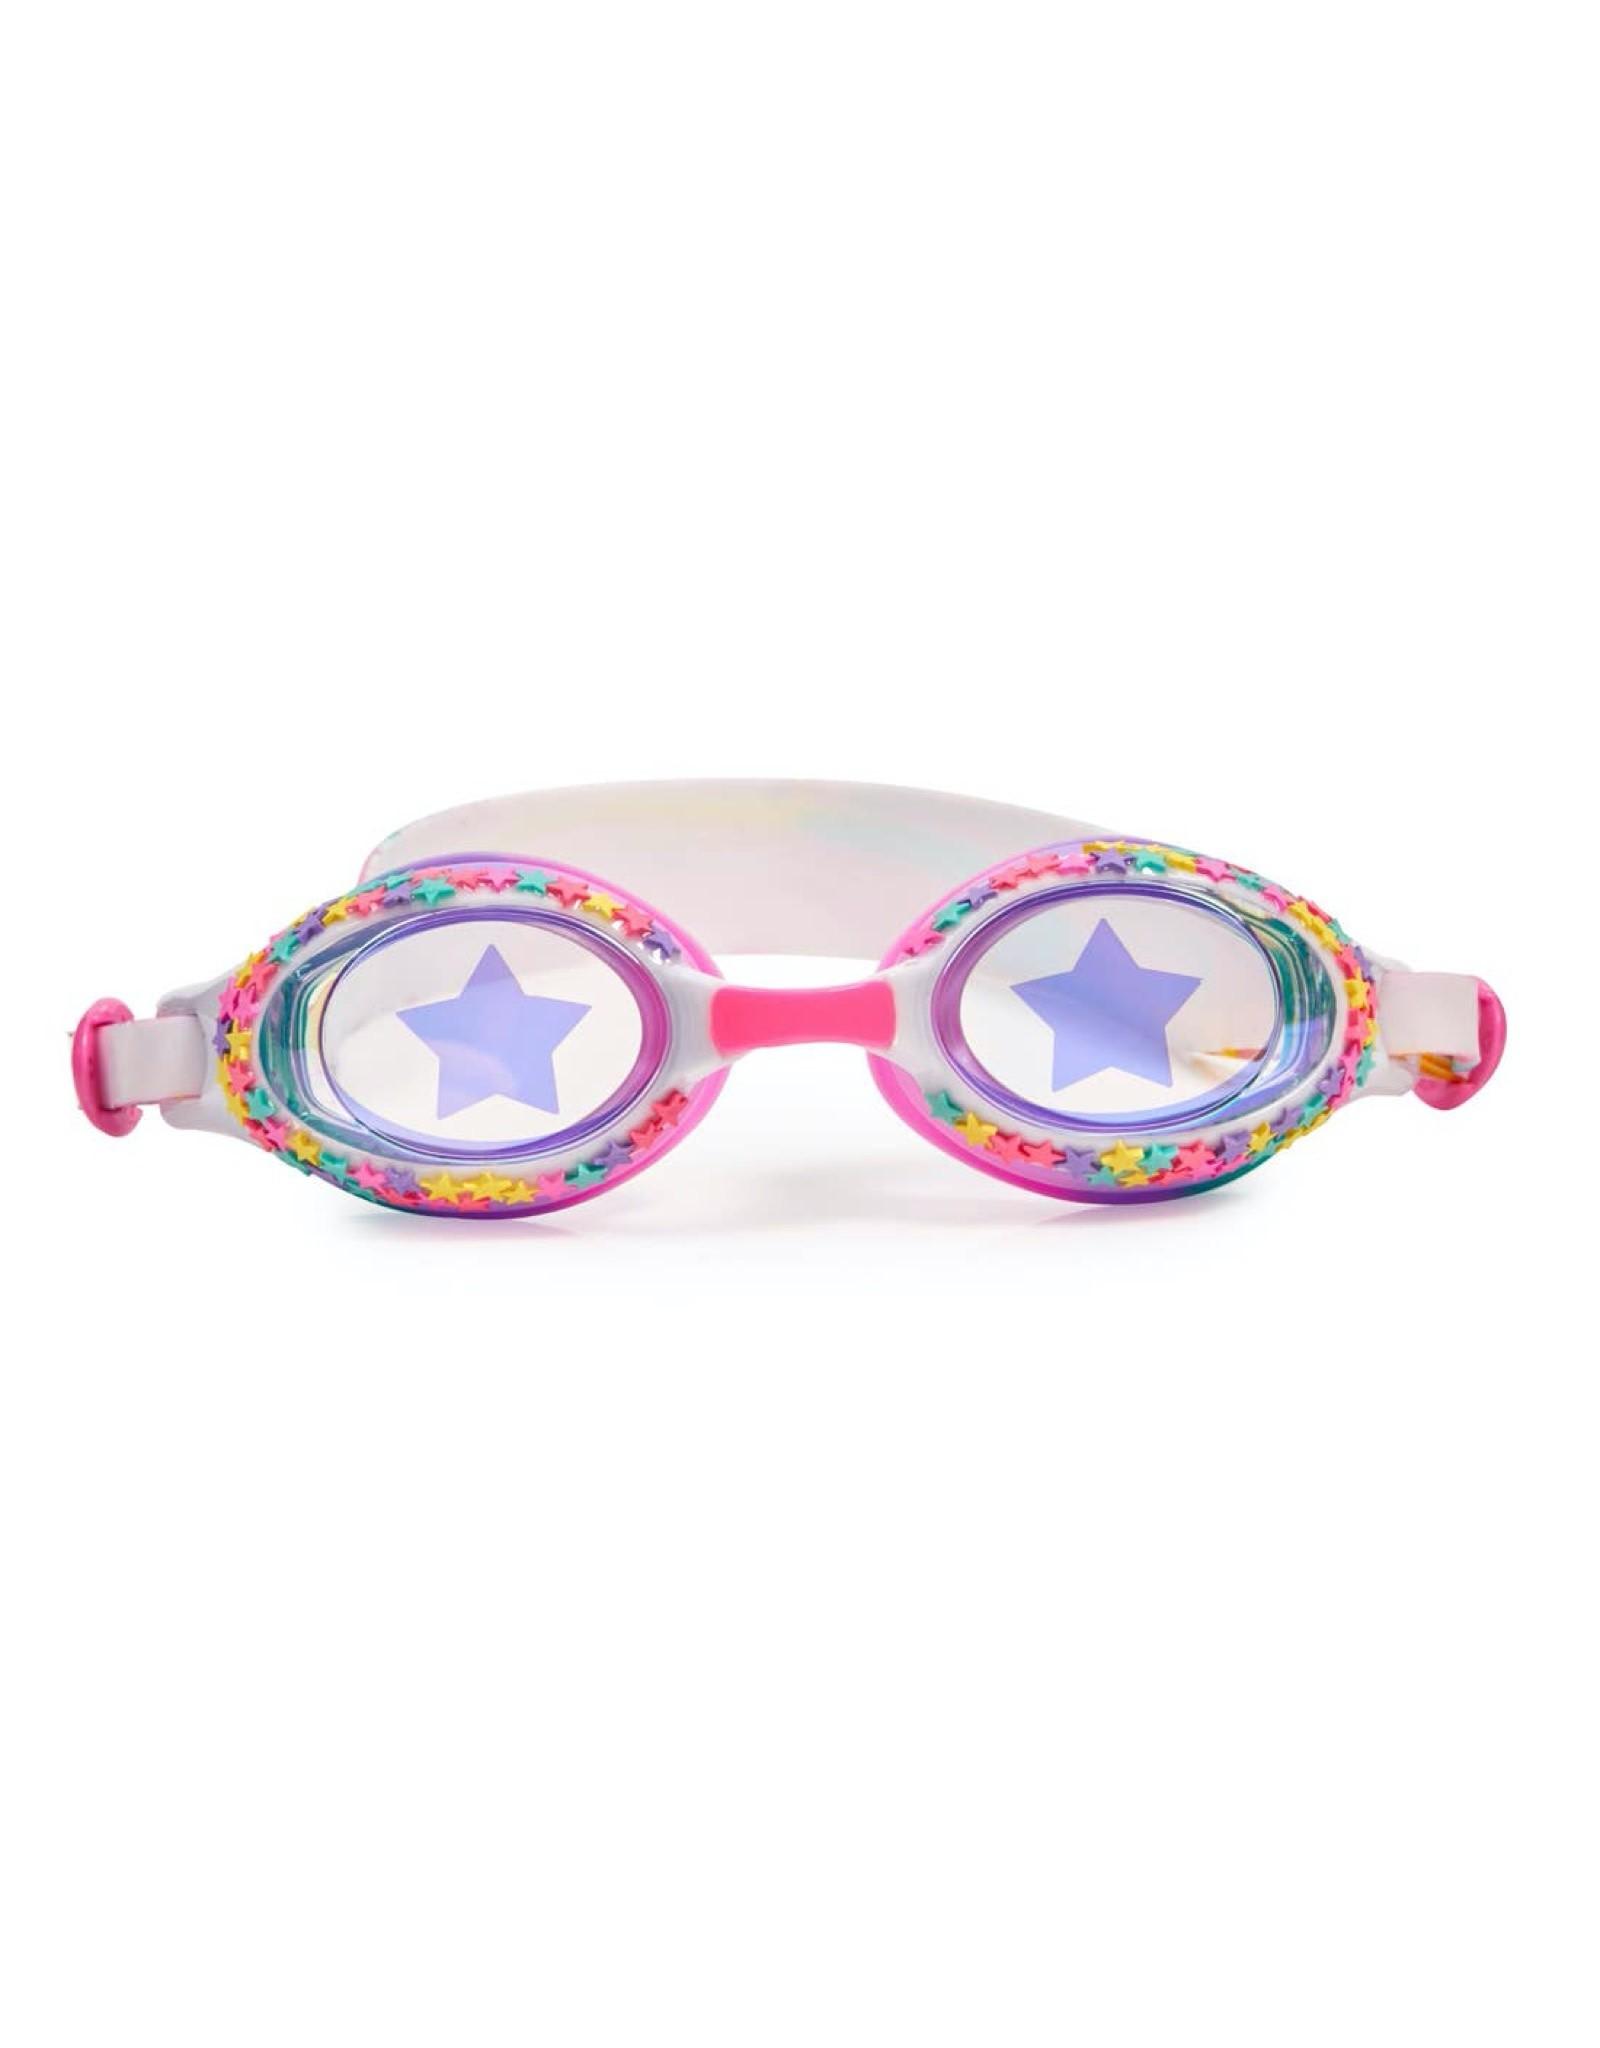 Bling2O Fireworks Swim Goggles